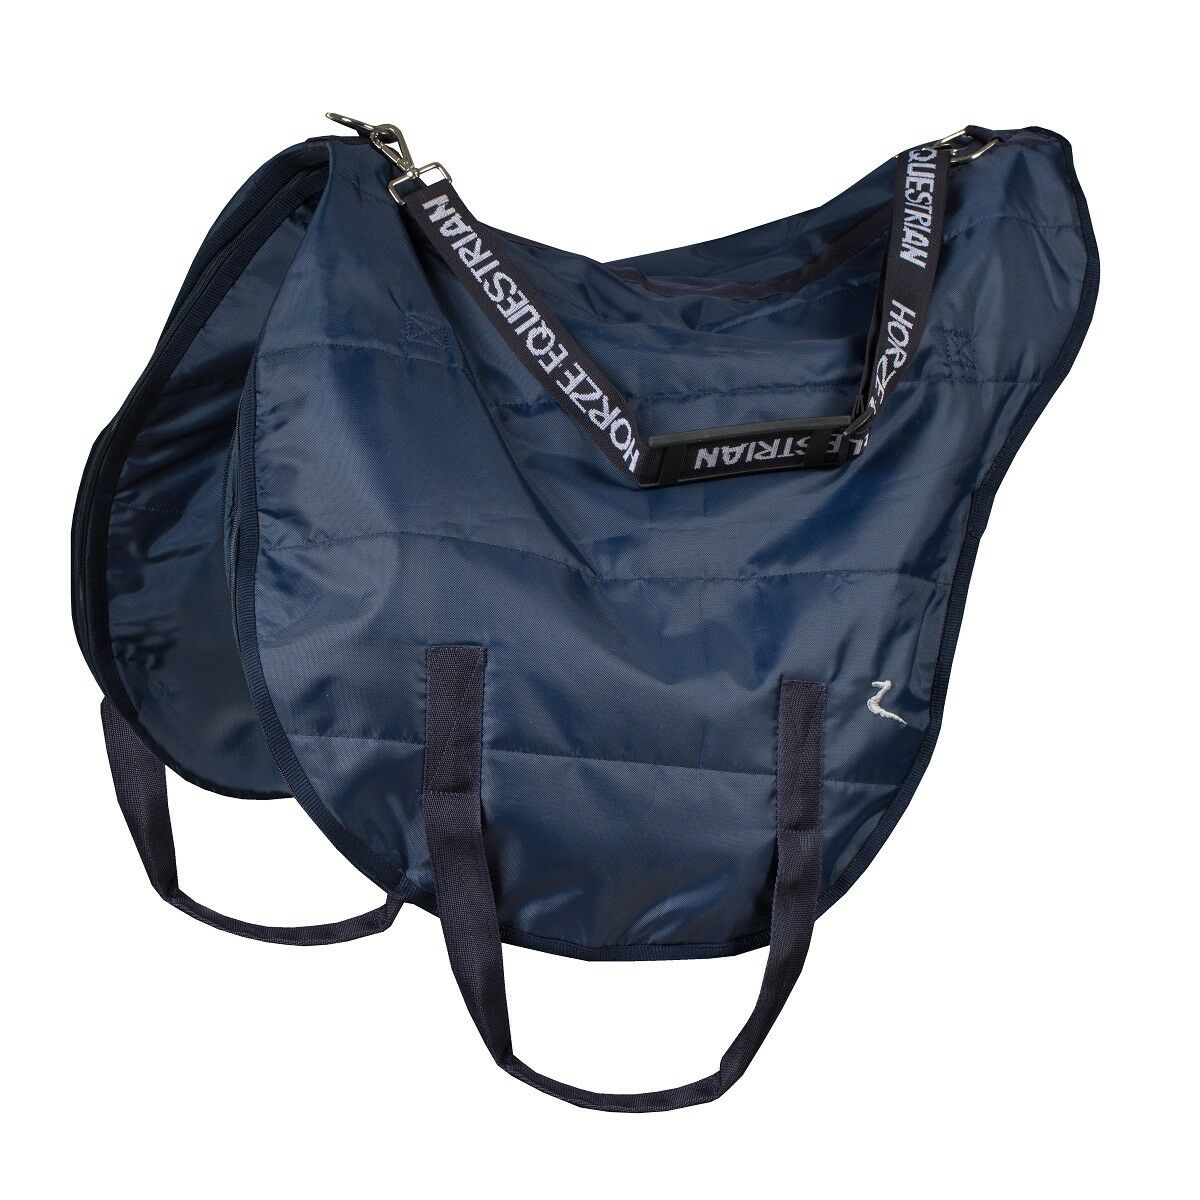 Horze Equestrian Navy Carry Strap Nylon All Purpose English Dressage  Saddle Bag  high quaity